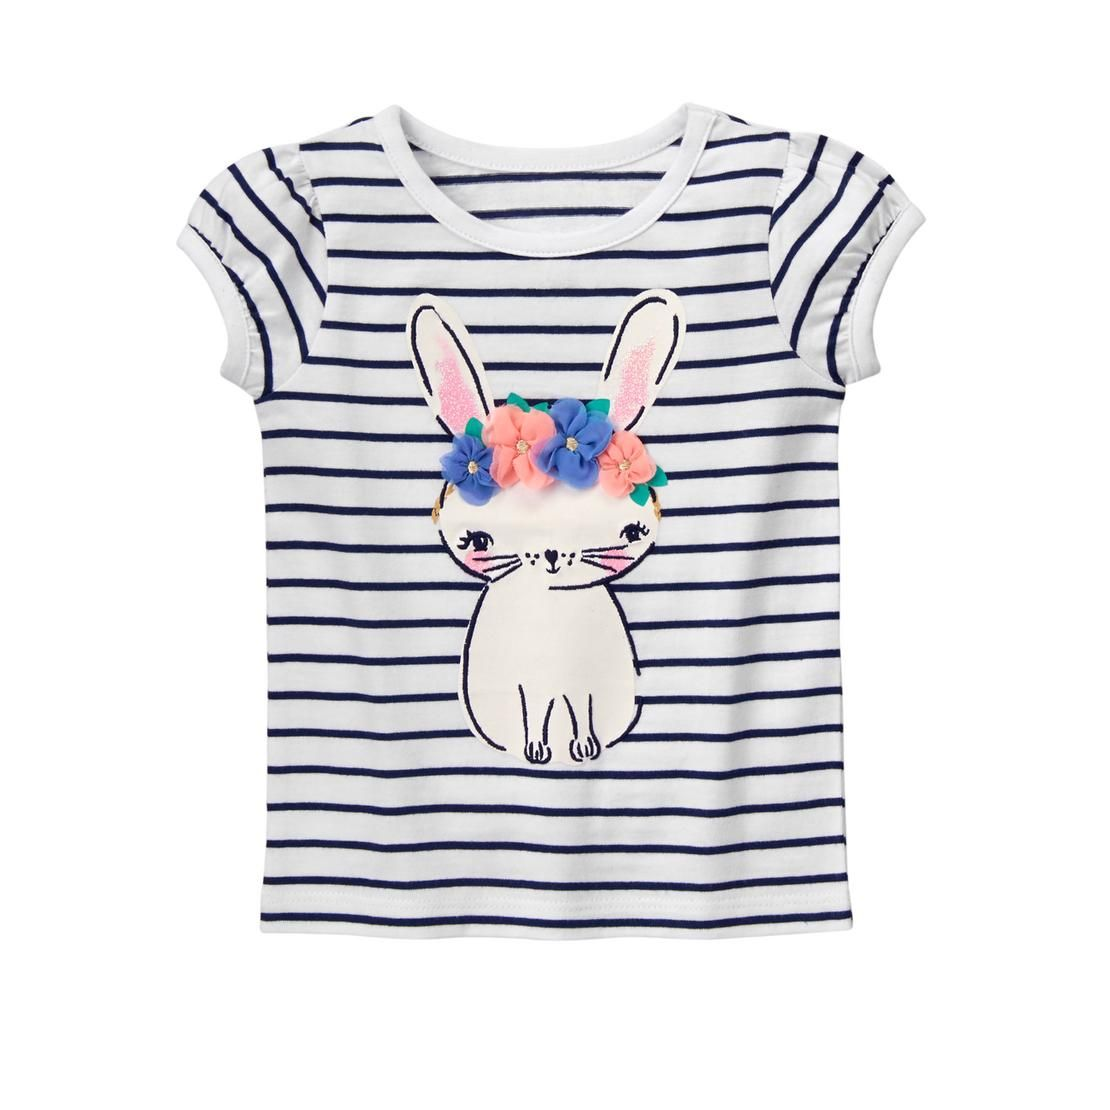 c4ad6f39f Toddler Girls Black Stripe Bunny Flower Tee by Gymboree